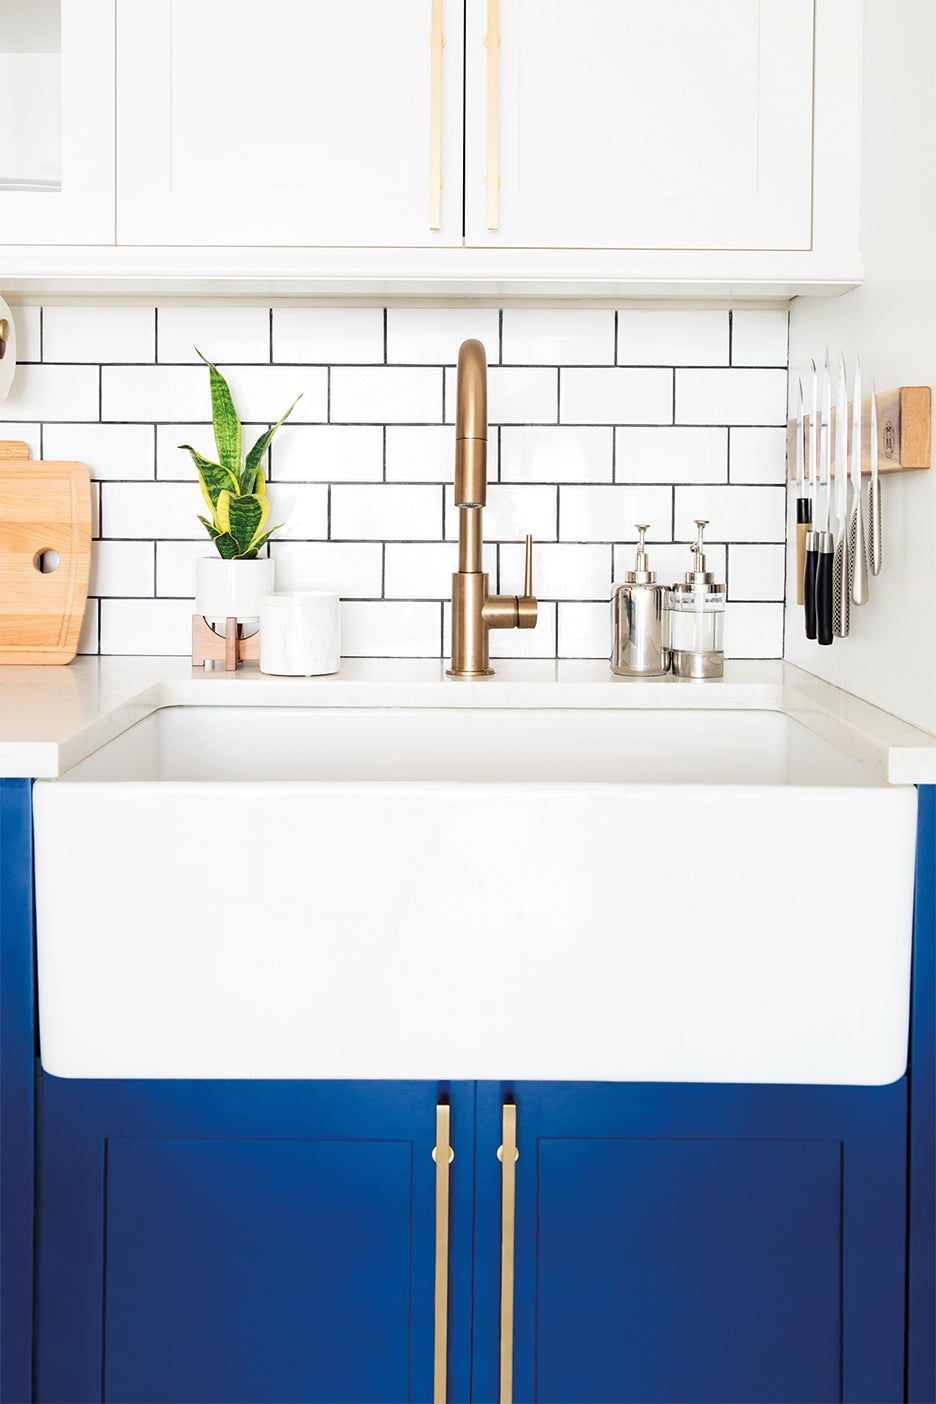 Kitchen sink with metallic knife strip next to it